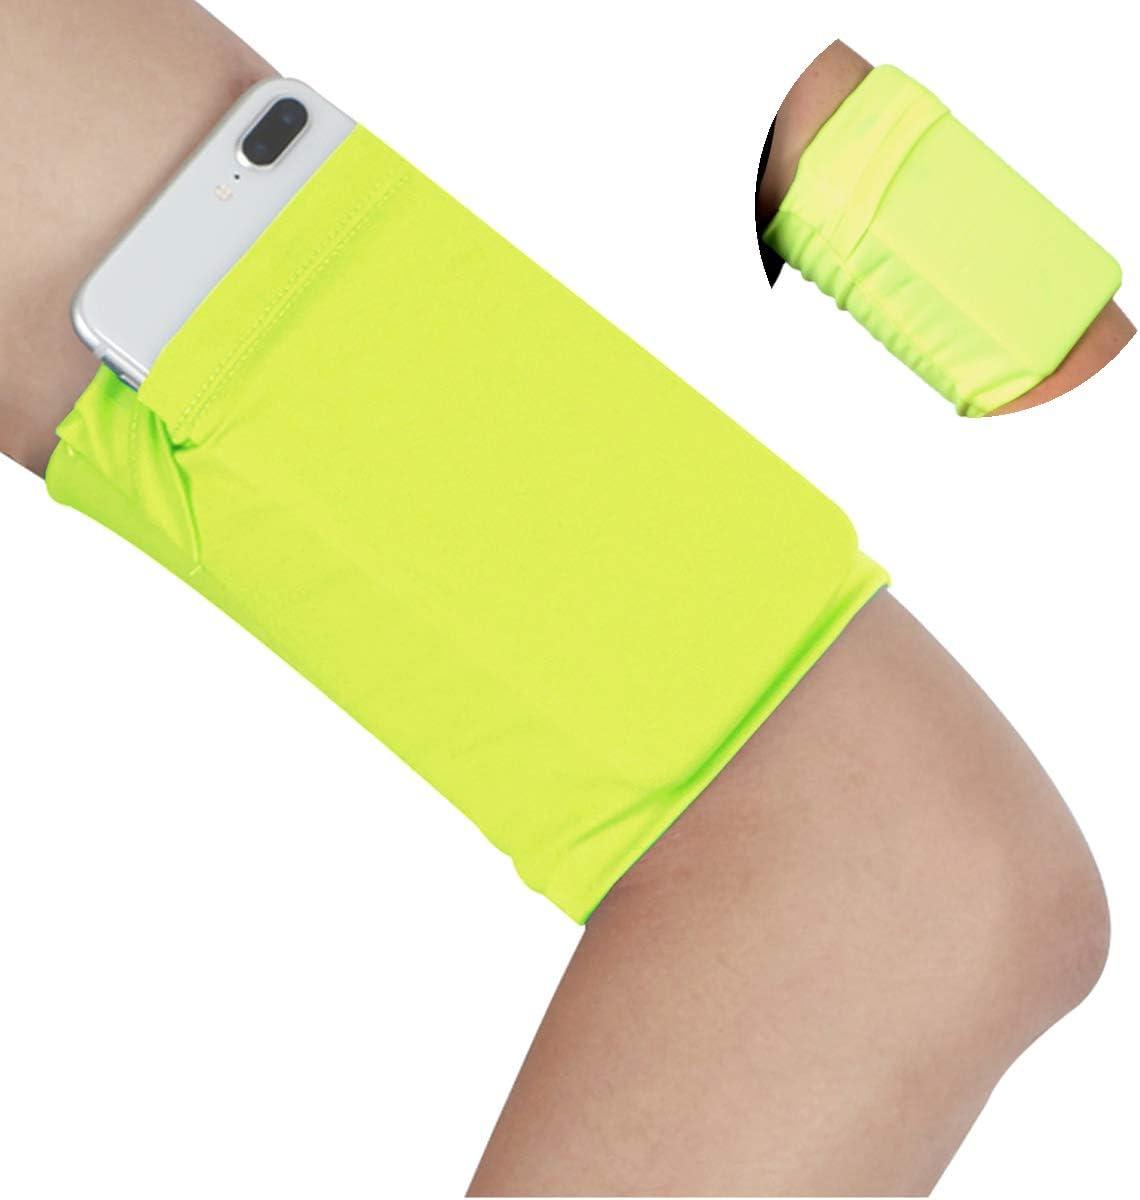 Armband Wristband for Keys Running Walking - Cell Phone Arm Wrist Band Sleeve Strap Wristband Pouch Case for Runs Walks Yoga Biking Fishing Skating Gardening Walk The Dog - Small/Fluorescent Yellow